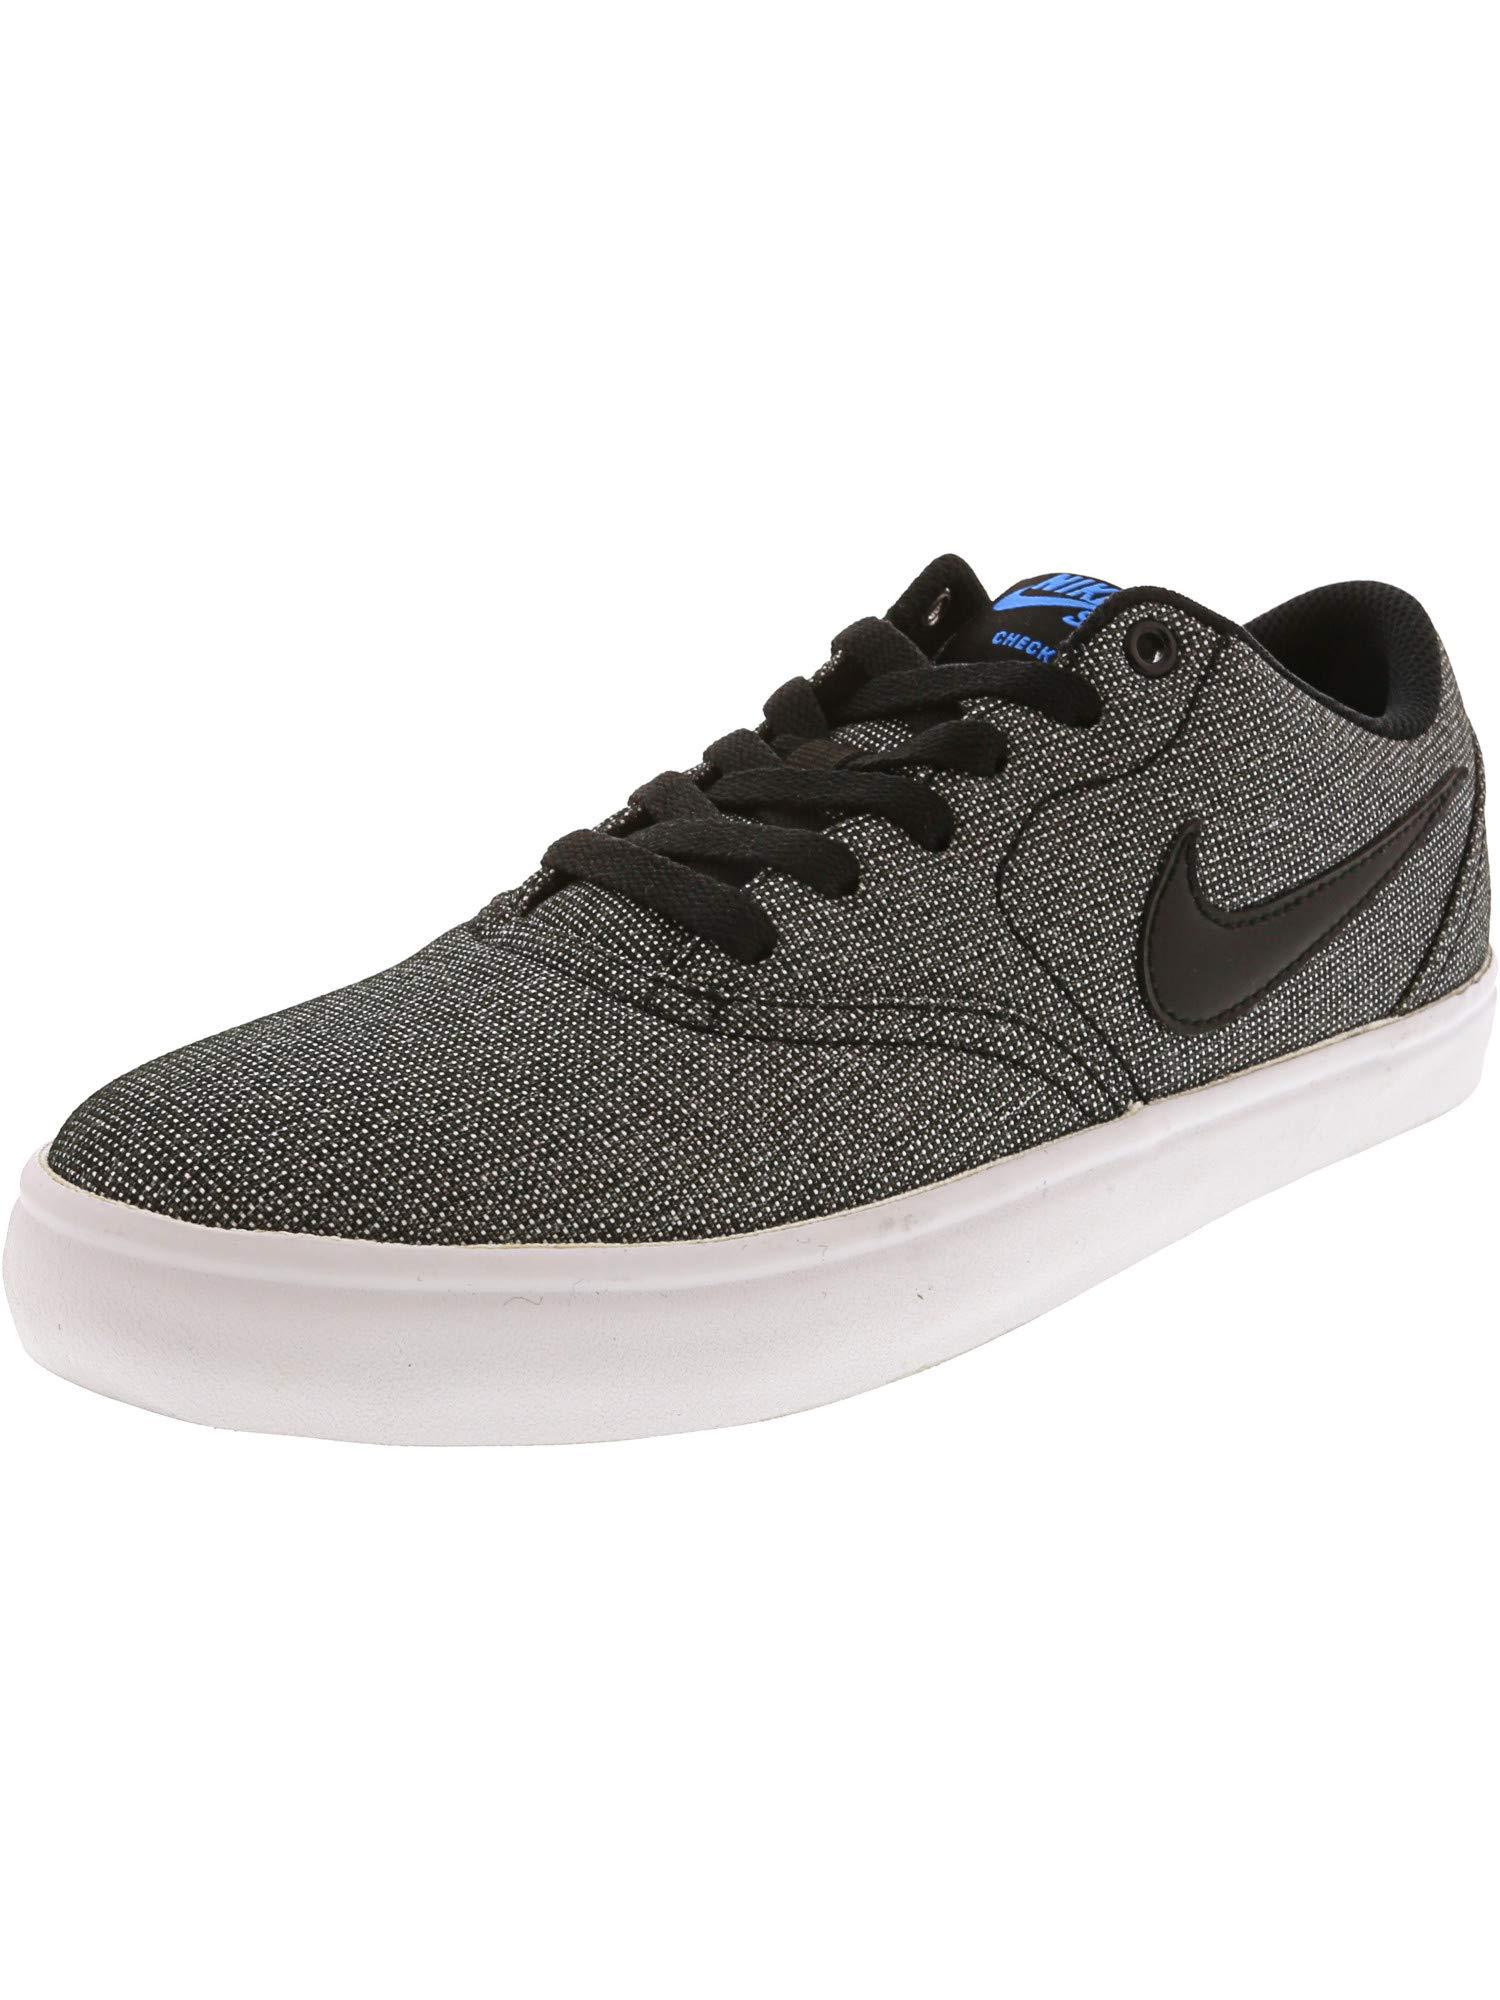 aa5cd8dd013 Nike Men's SB Check Solar Canvas Skate Shoe, Grey/Black/Photo Blue/Black,  7.5 M US